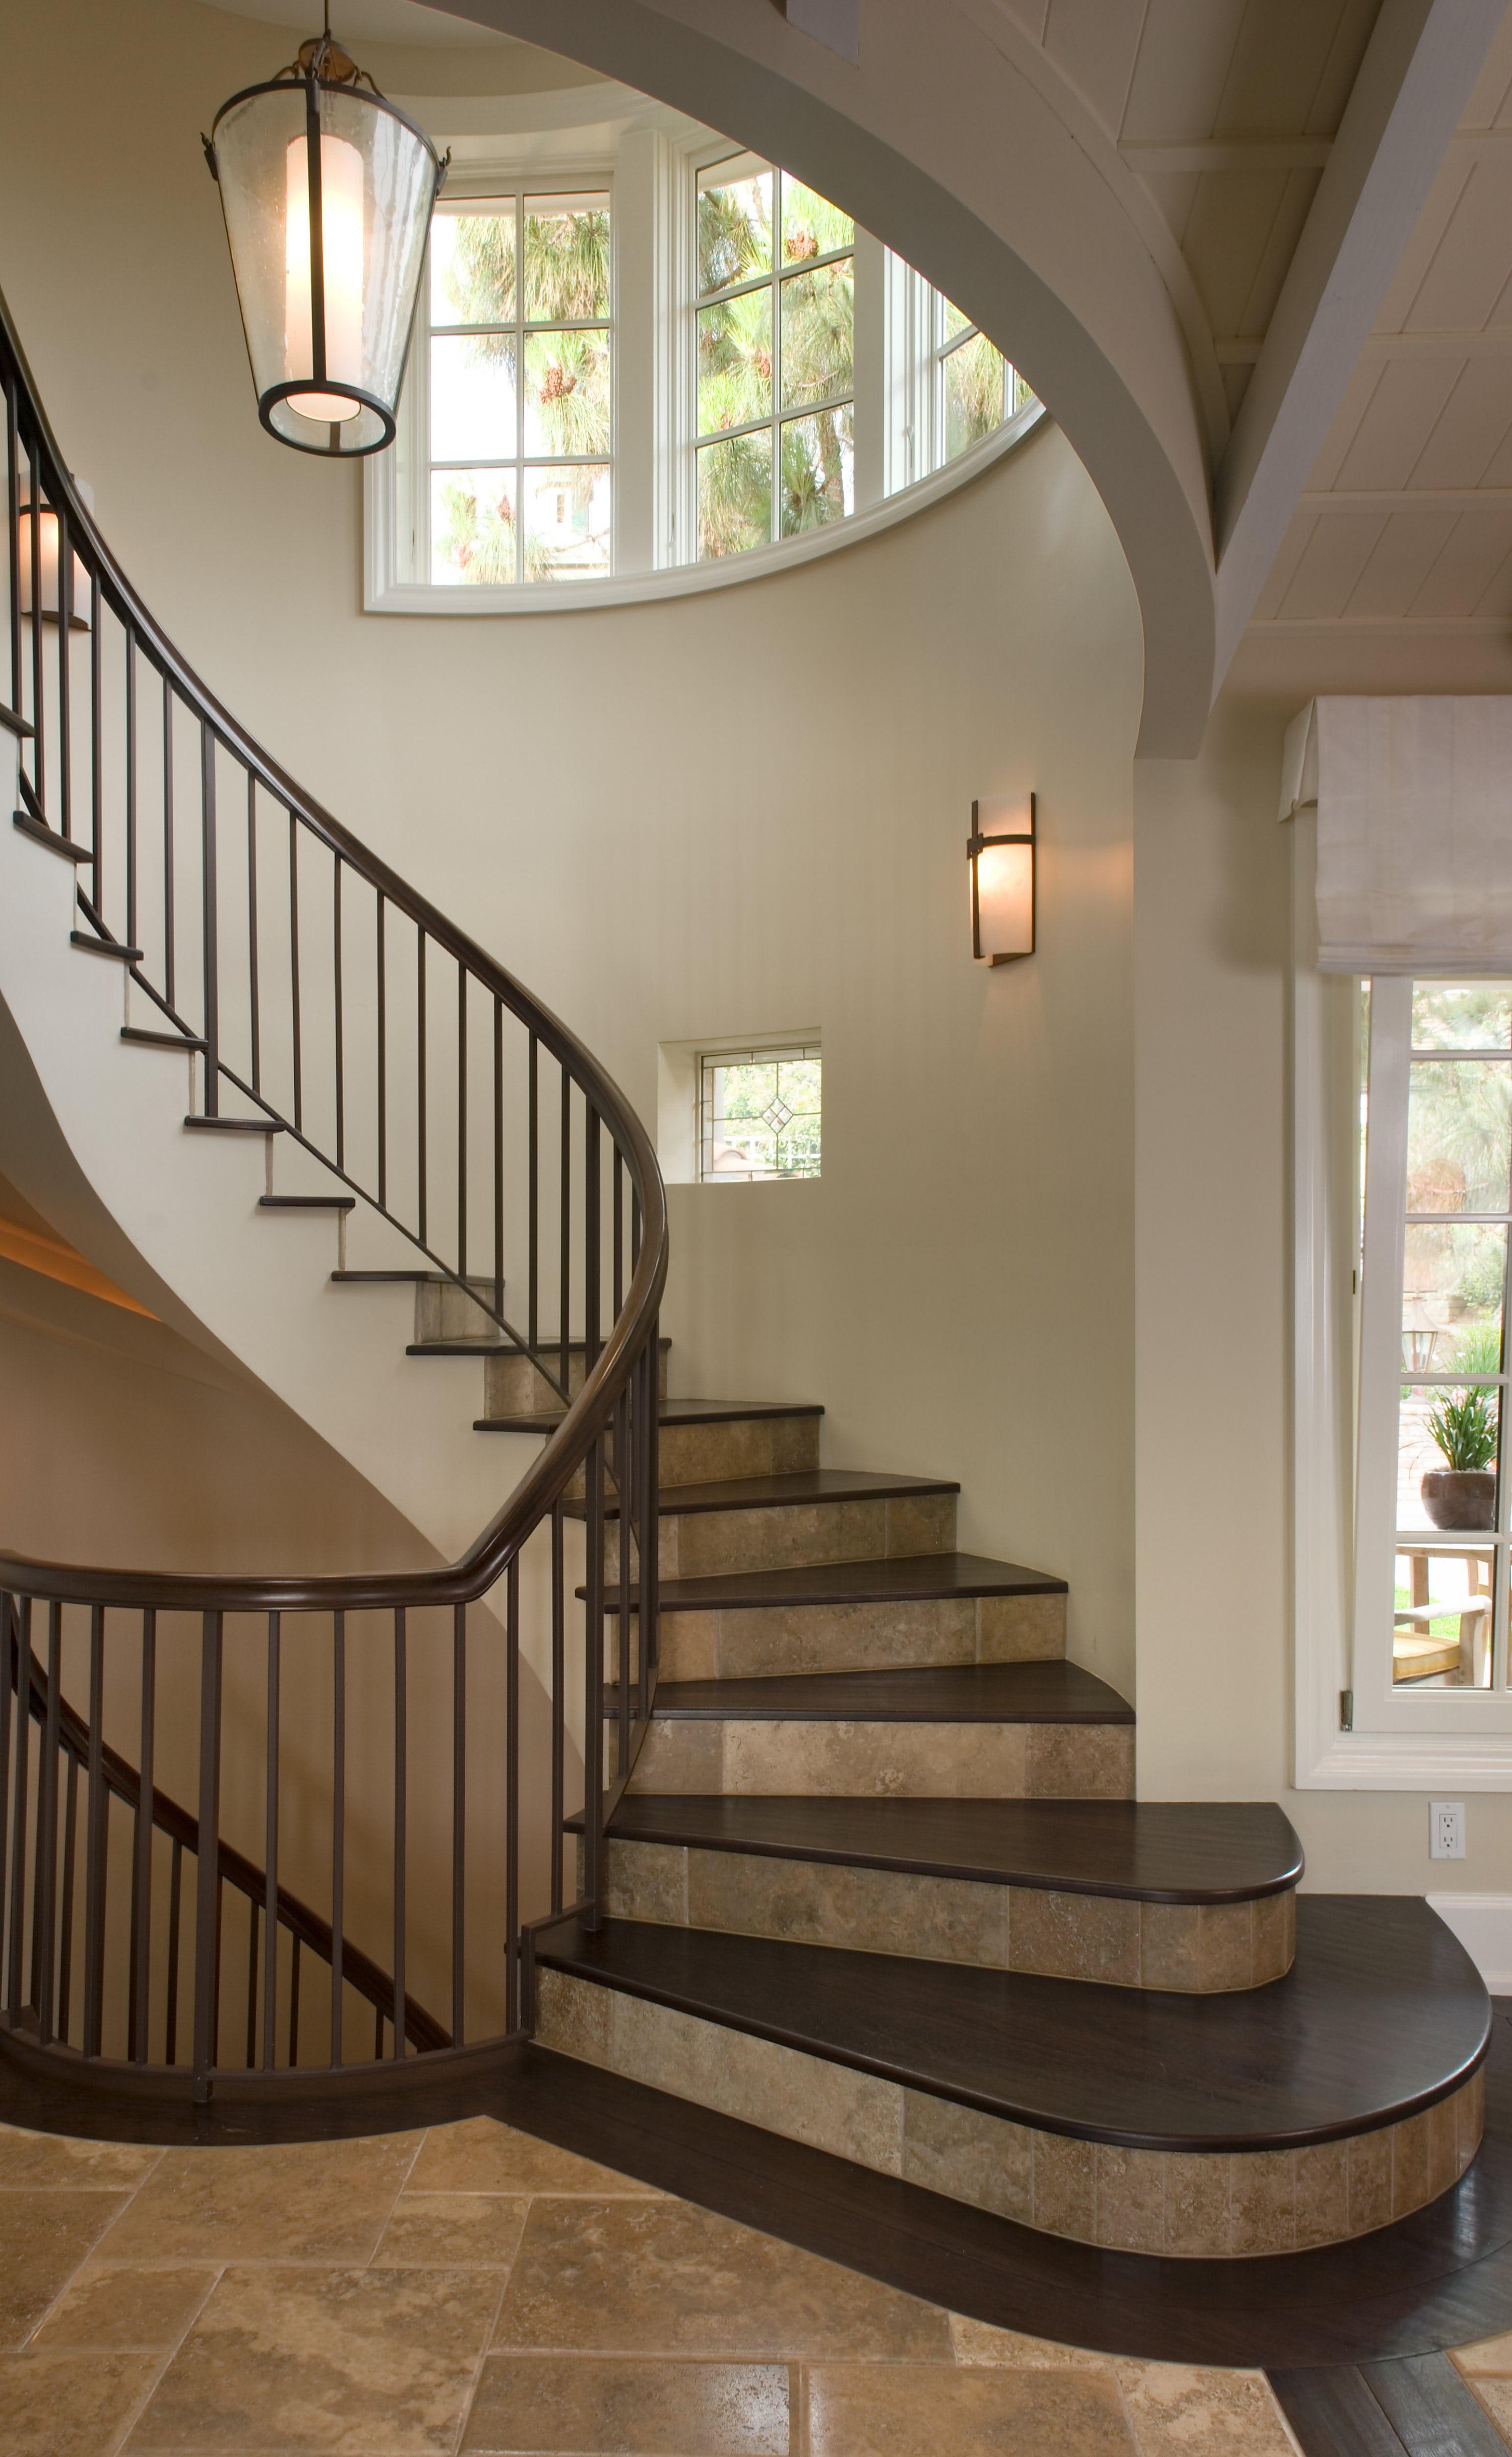 Krambs stairwell  1505675083 61003